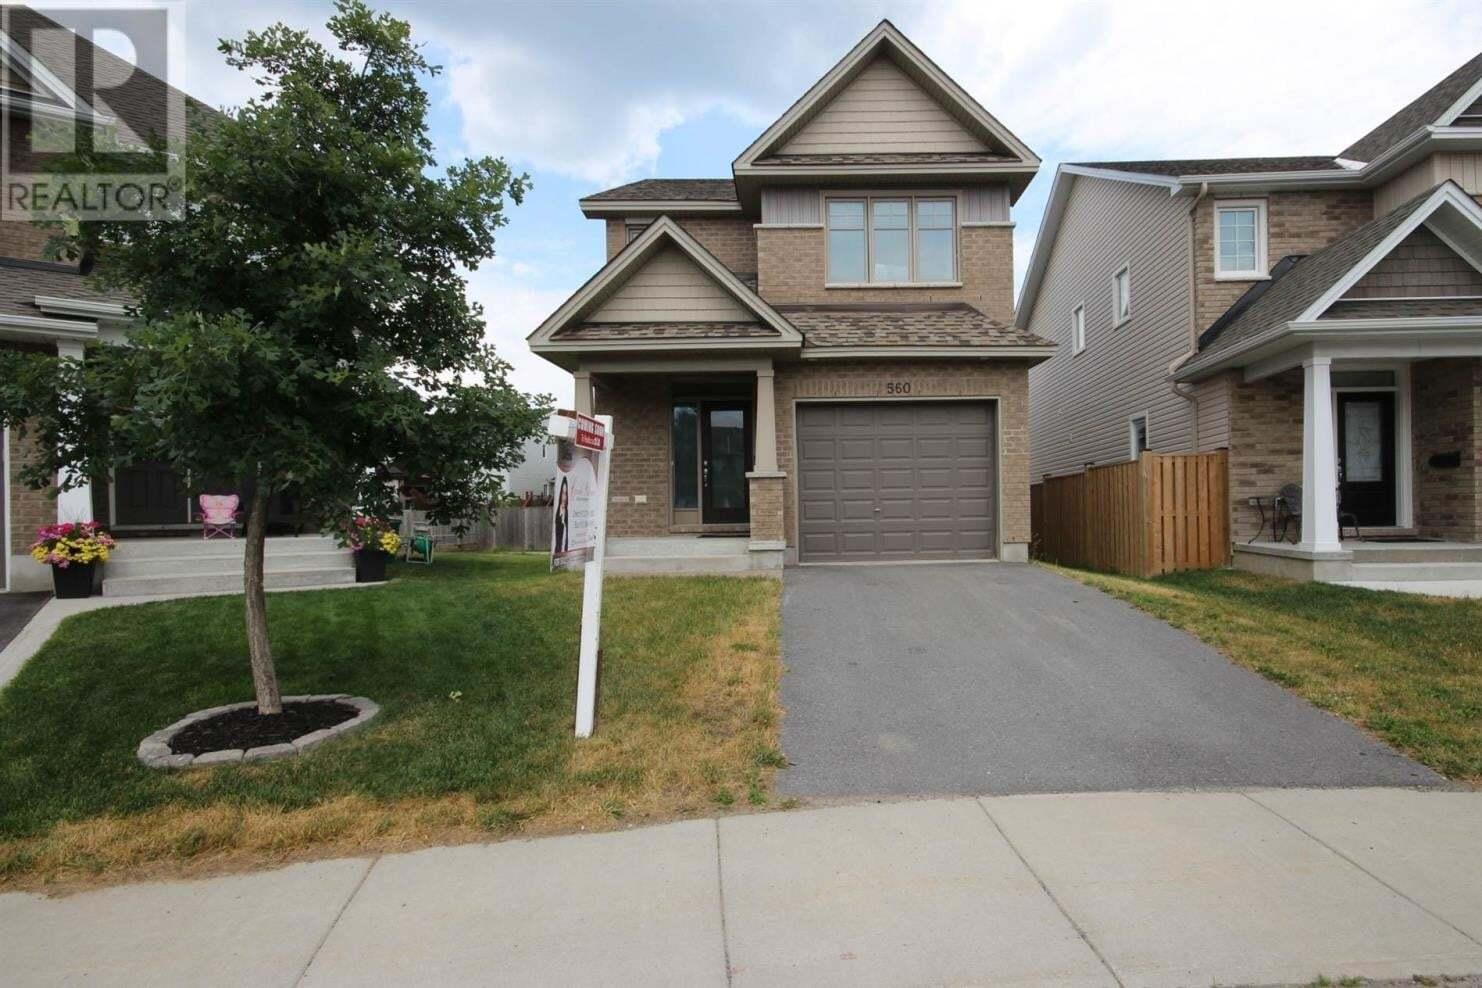 House for sale at 560 Savannah Ct Kingston Ontario - MLS: K20003702